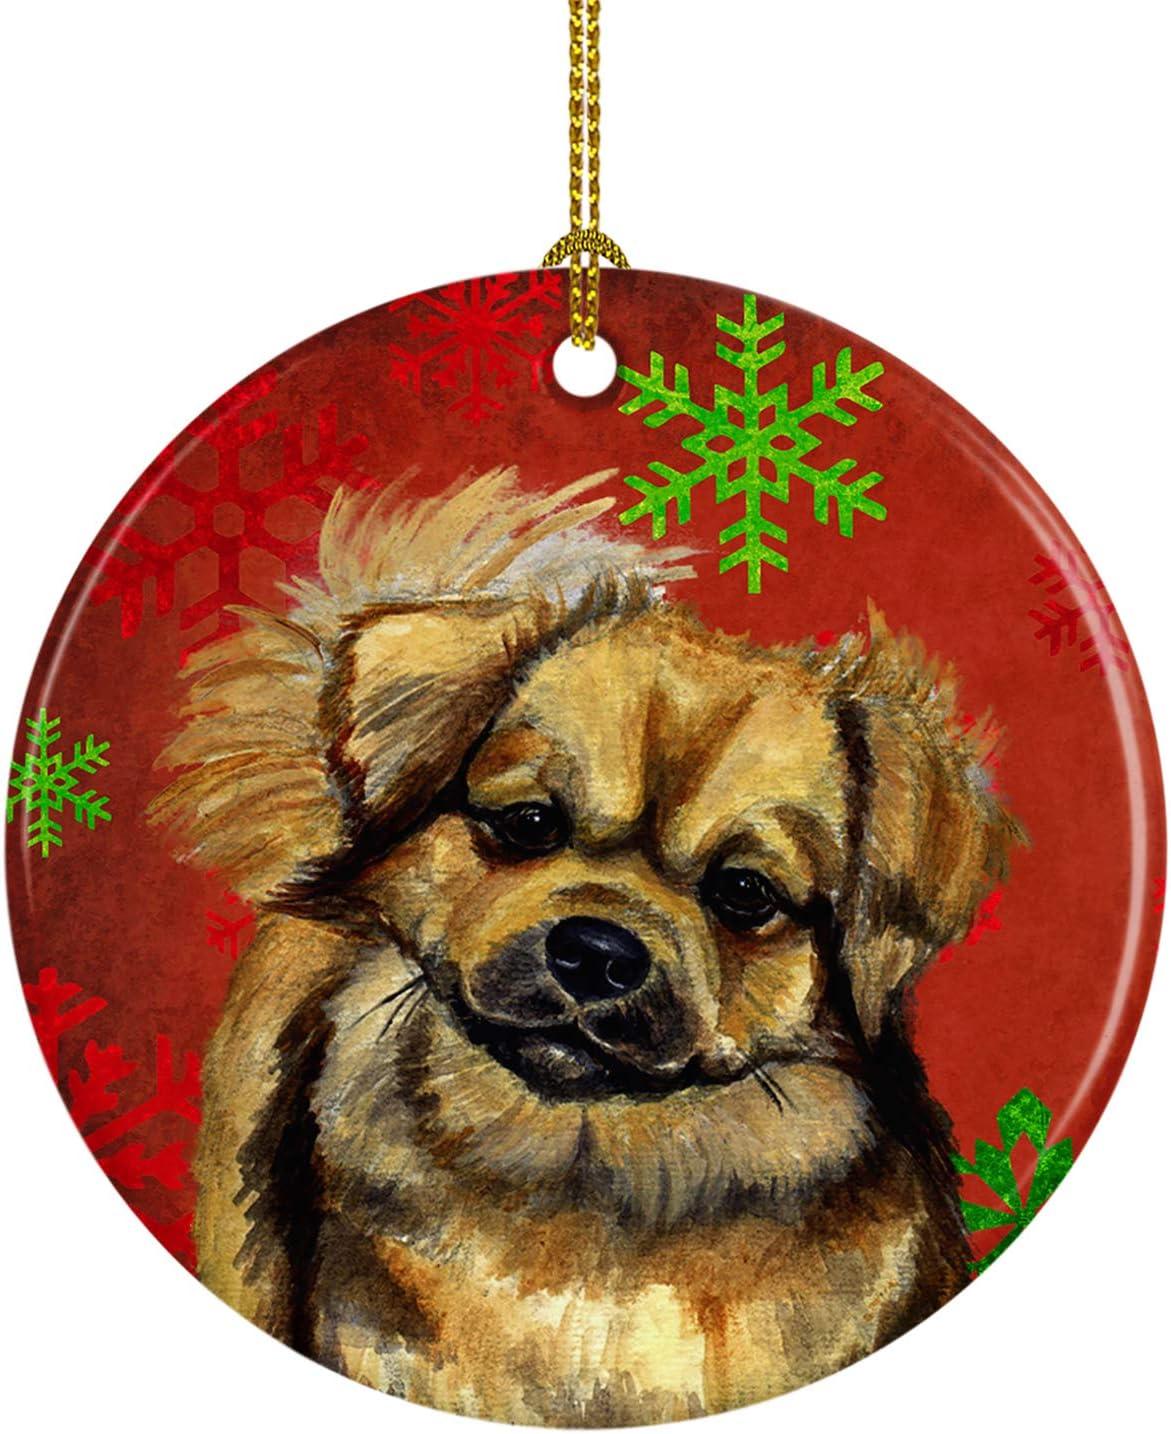 Caroline's Outlet SALE Treasures Fees free LH9349-CO1 Tibetan Spaniel Green Snowfl Red